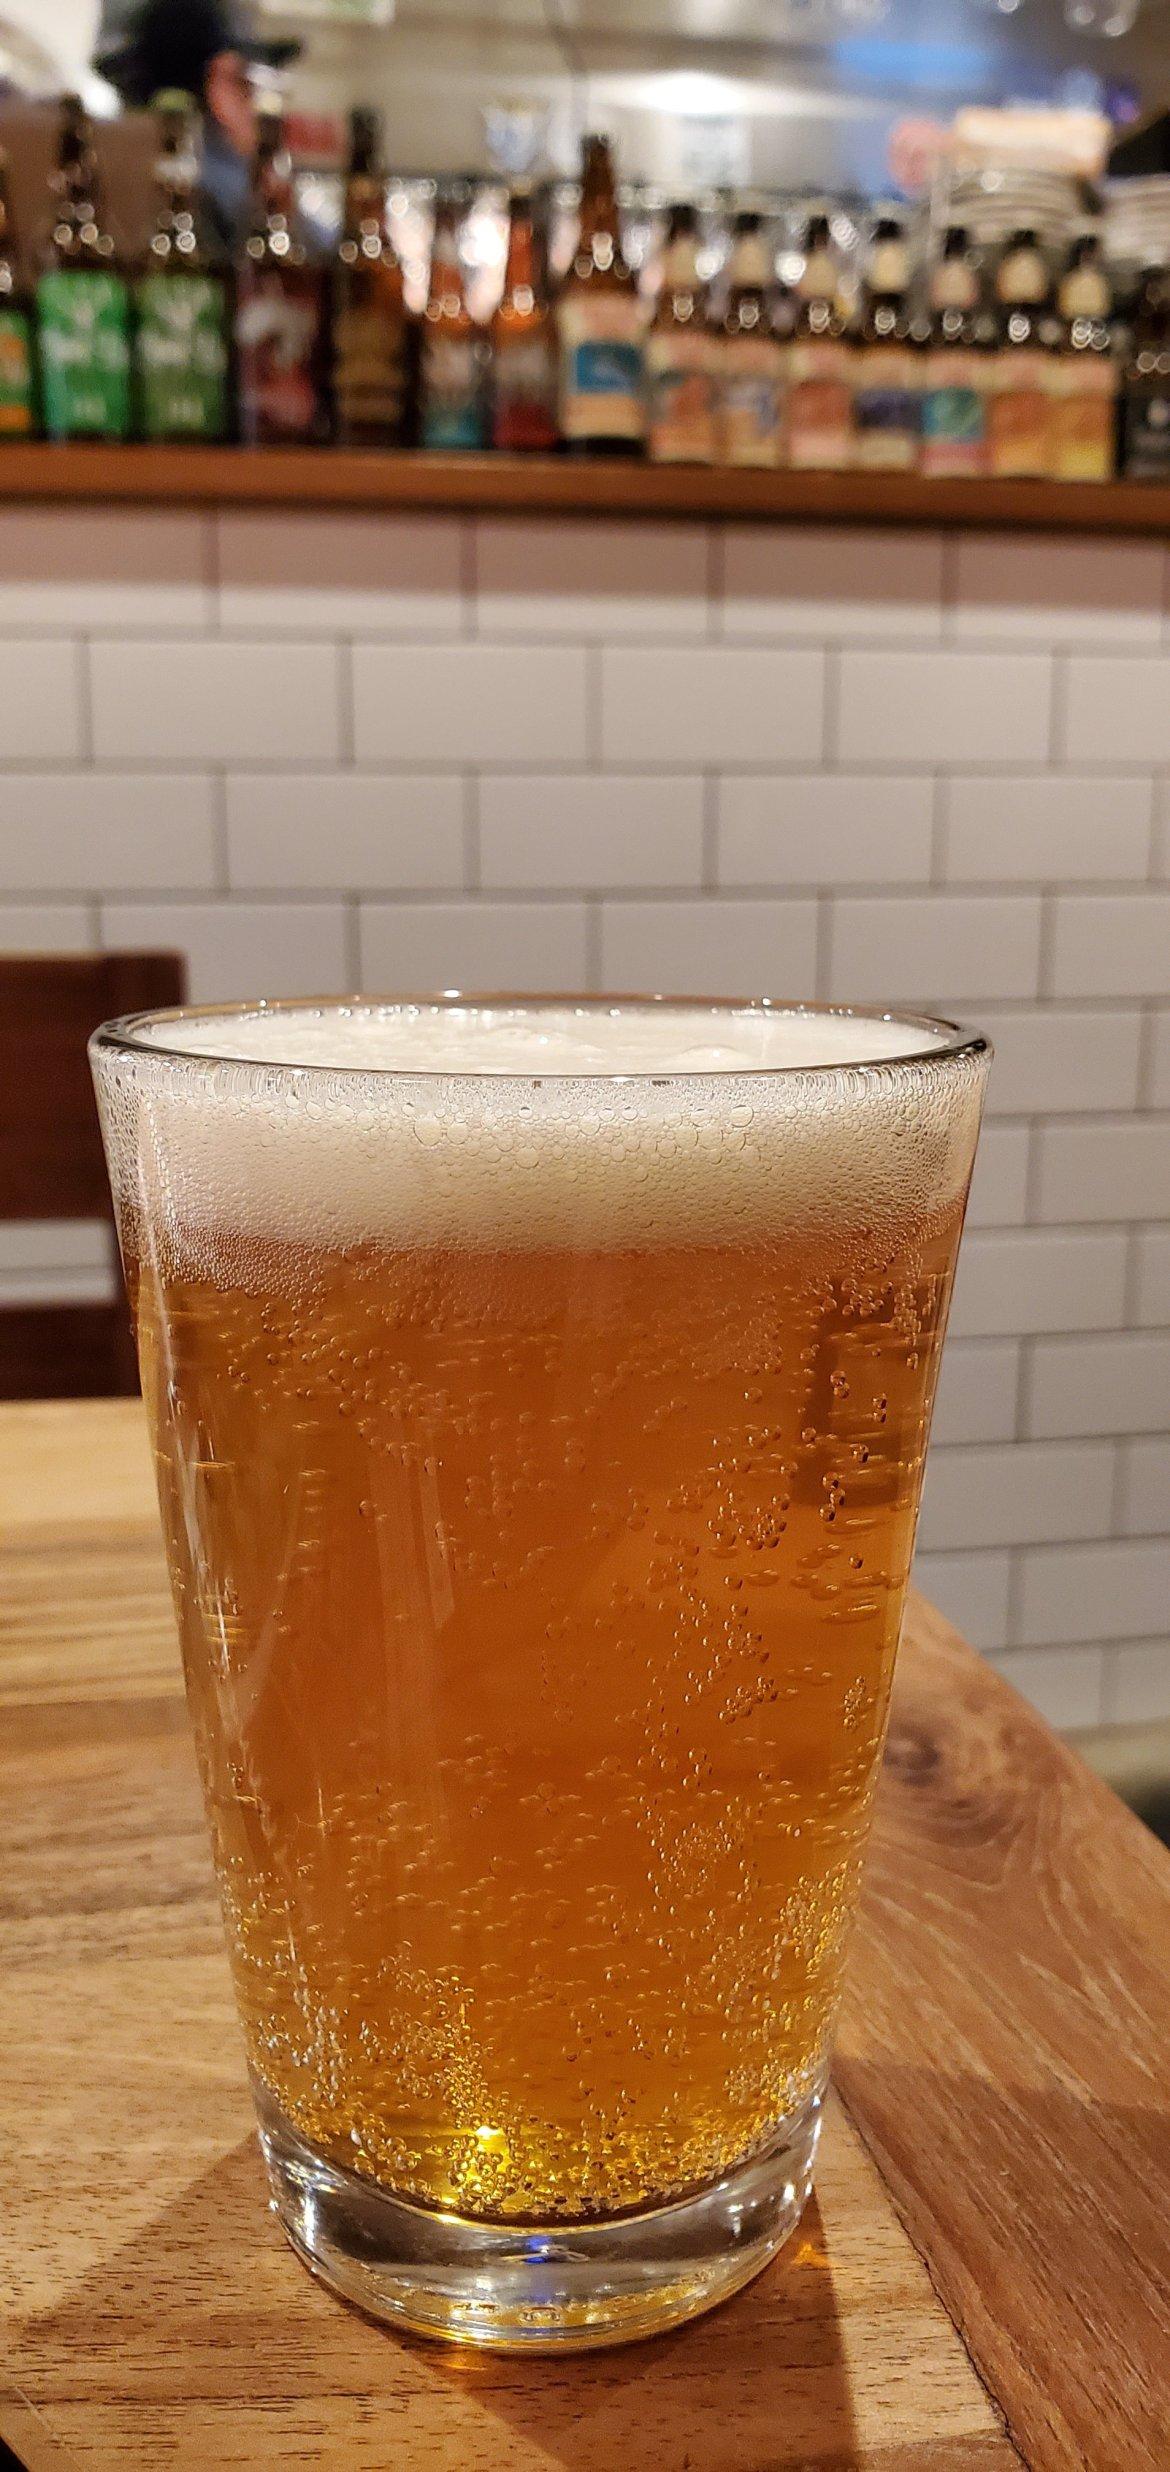 Cruz Burgers & Craft Beer Beer 2・クルズバーガーズ アンド クラフトビアビール2